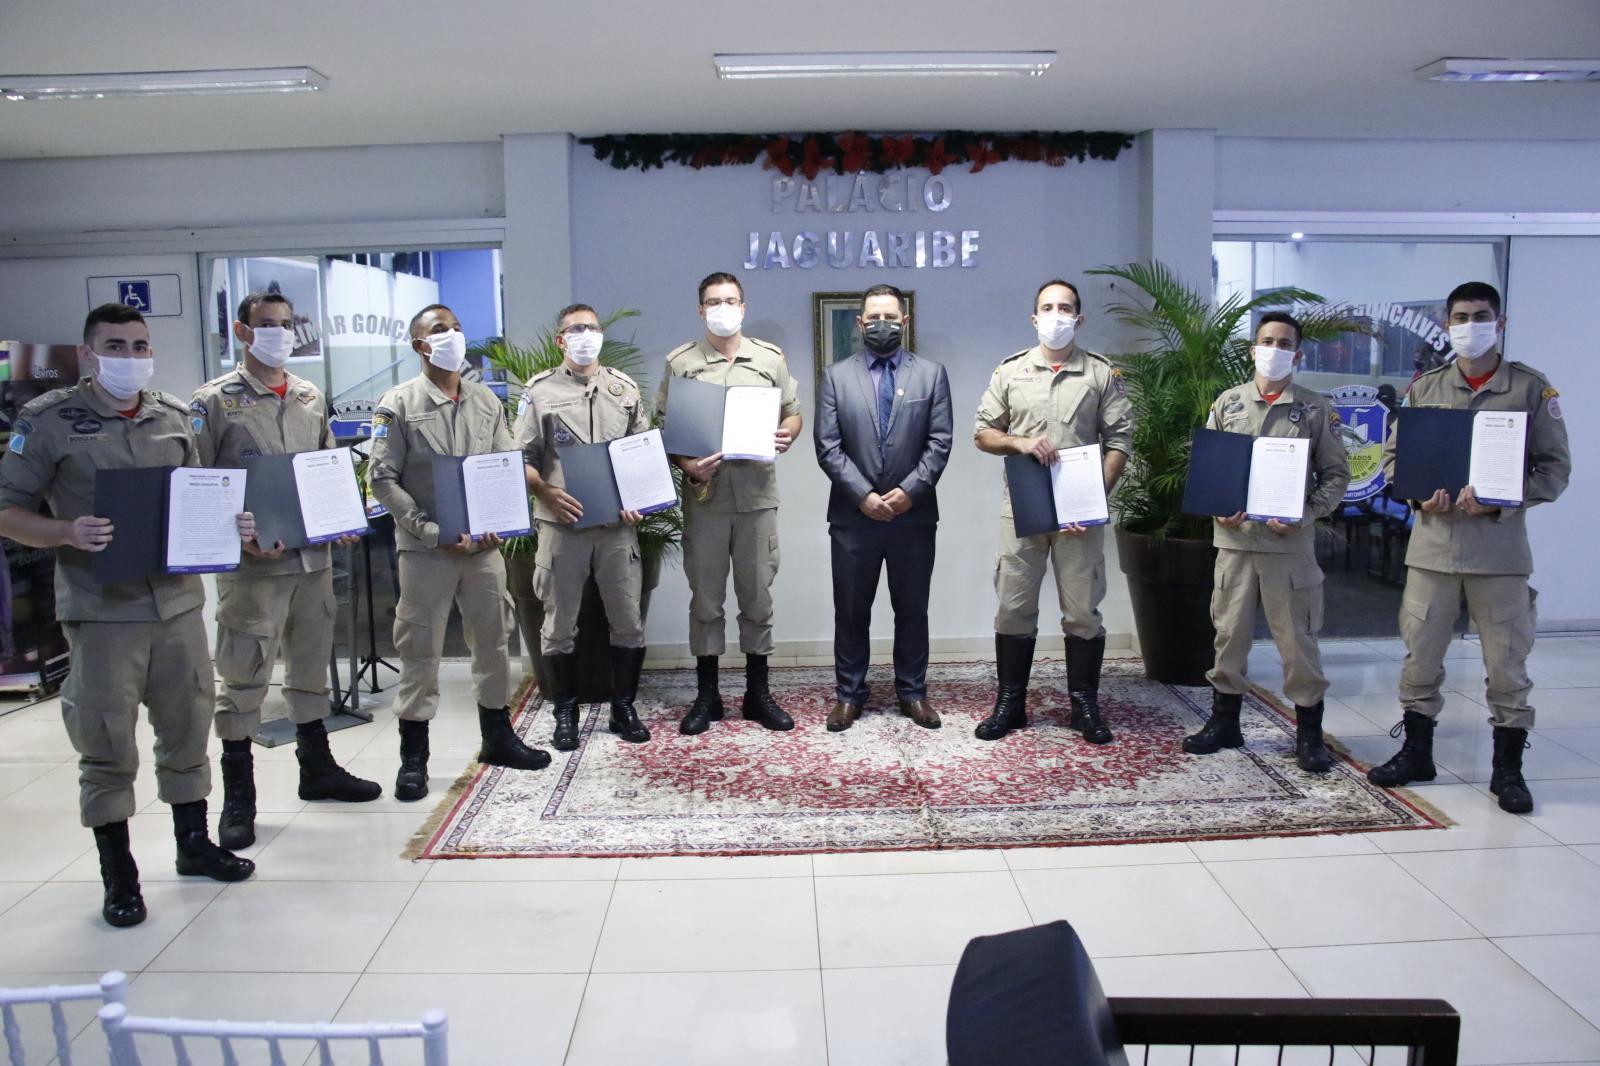 Vereador Jânio Miguel entrega títulos e honrarias aos seus homenageados